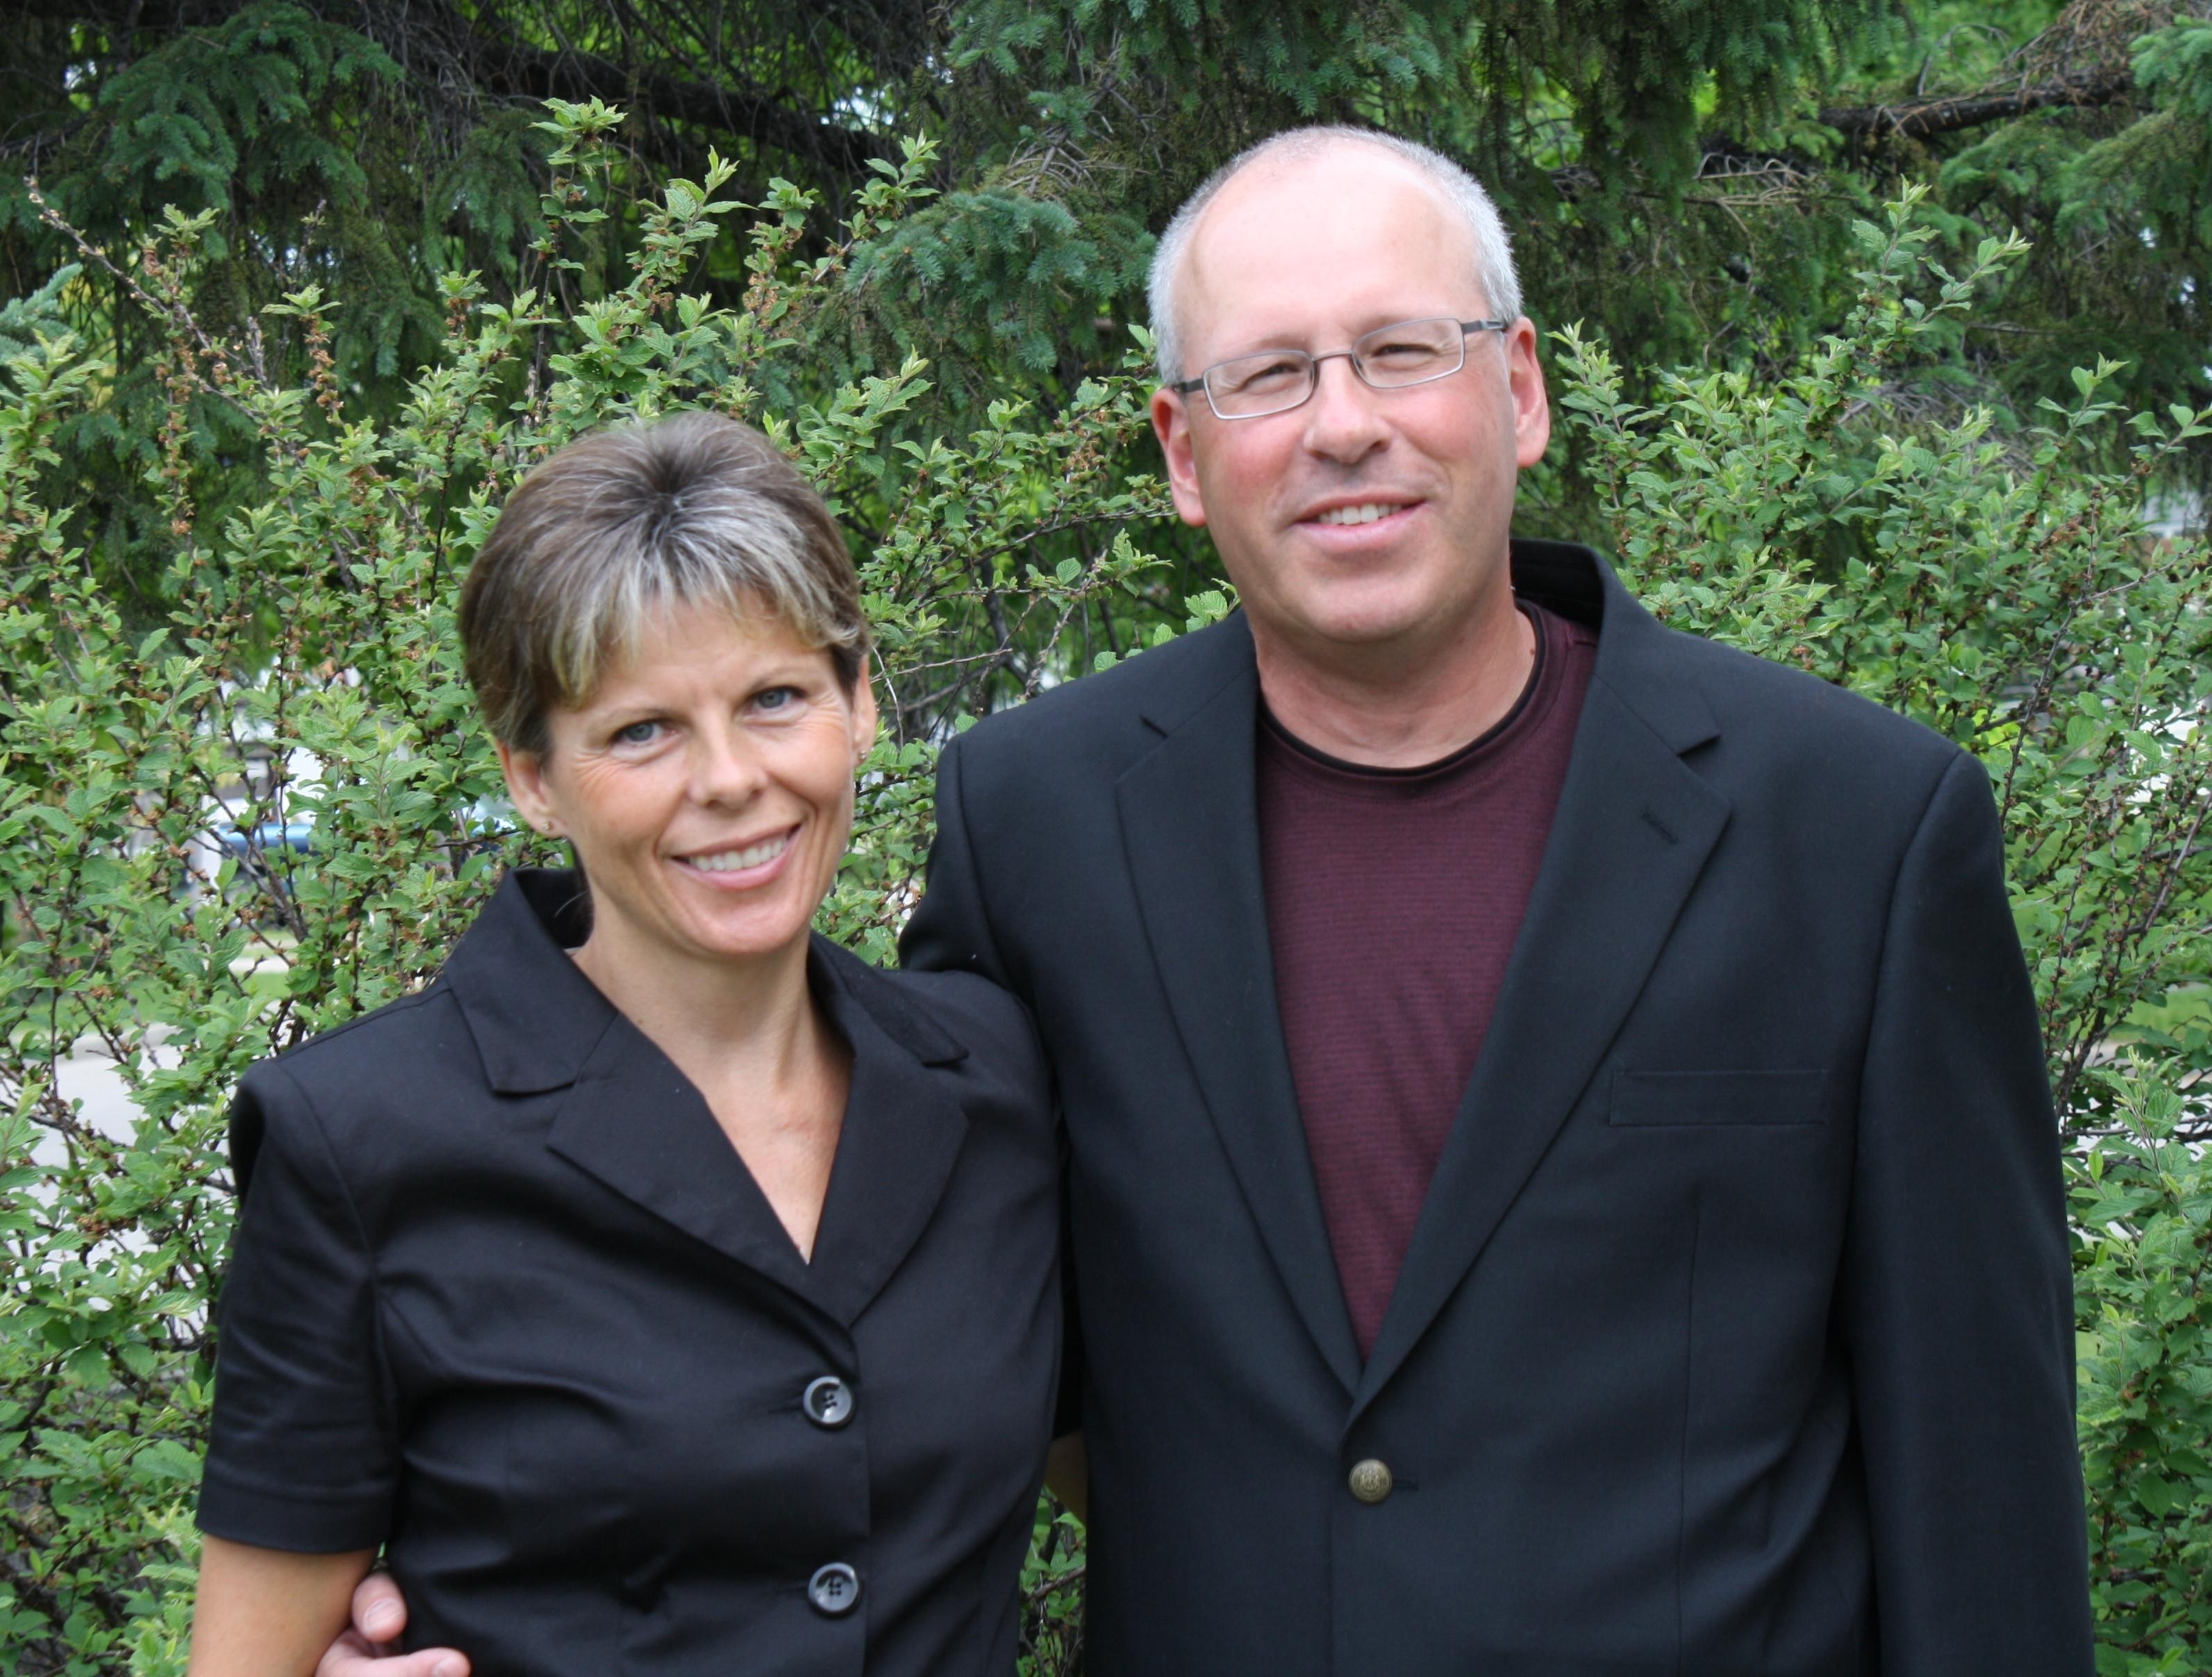 Pam & Steve P.